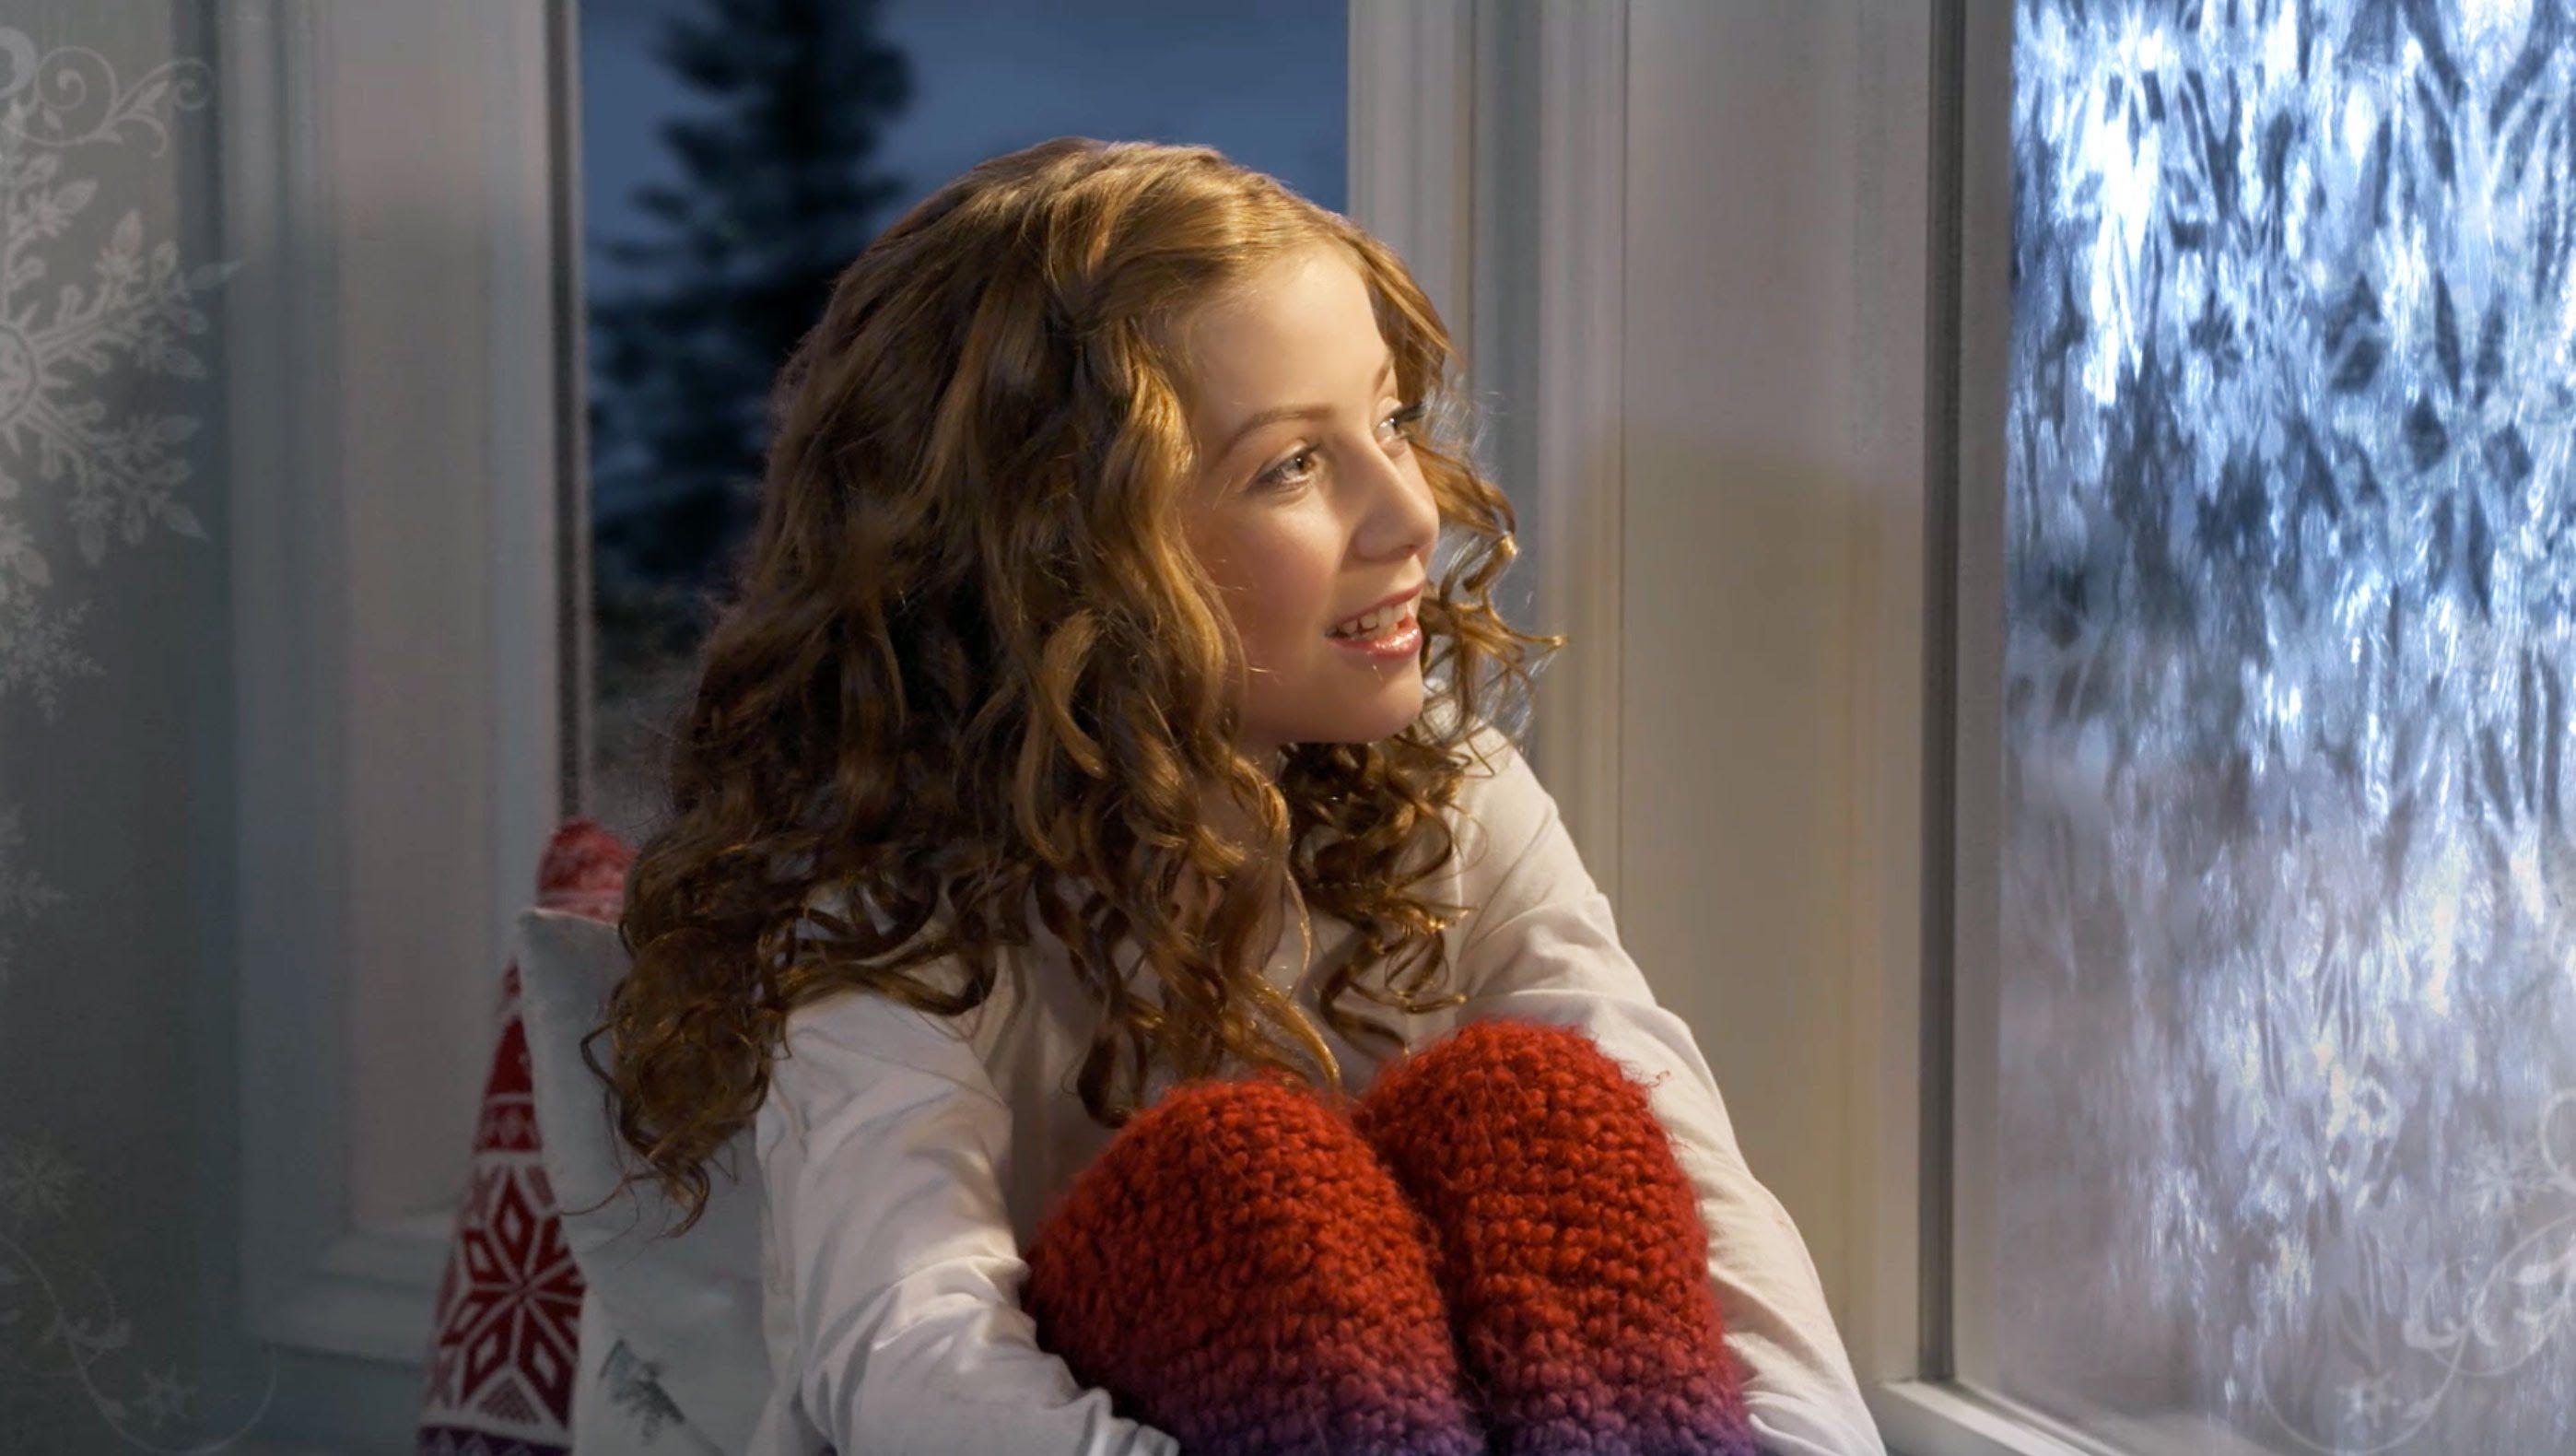 Singing phenomenon Lexi Walker makes a Christmas classic